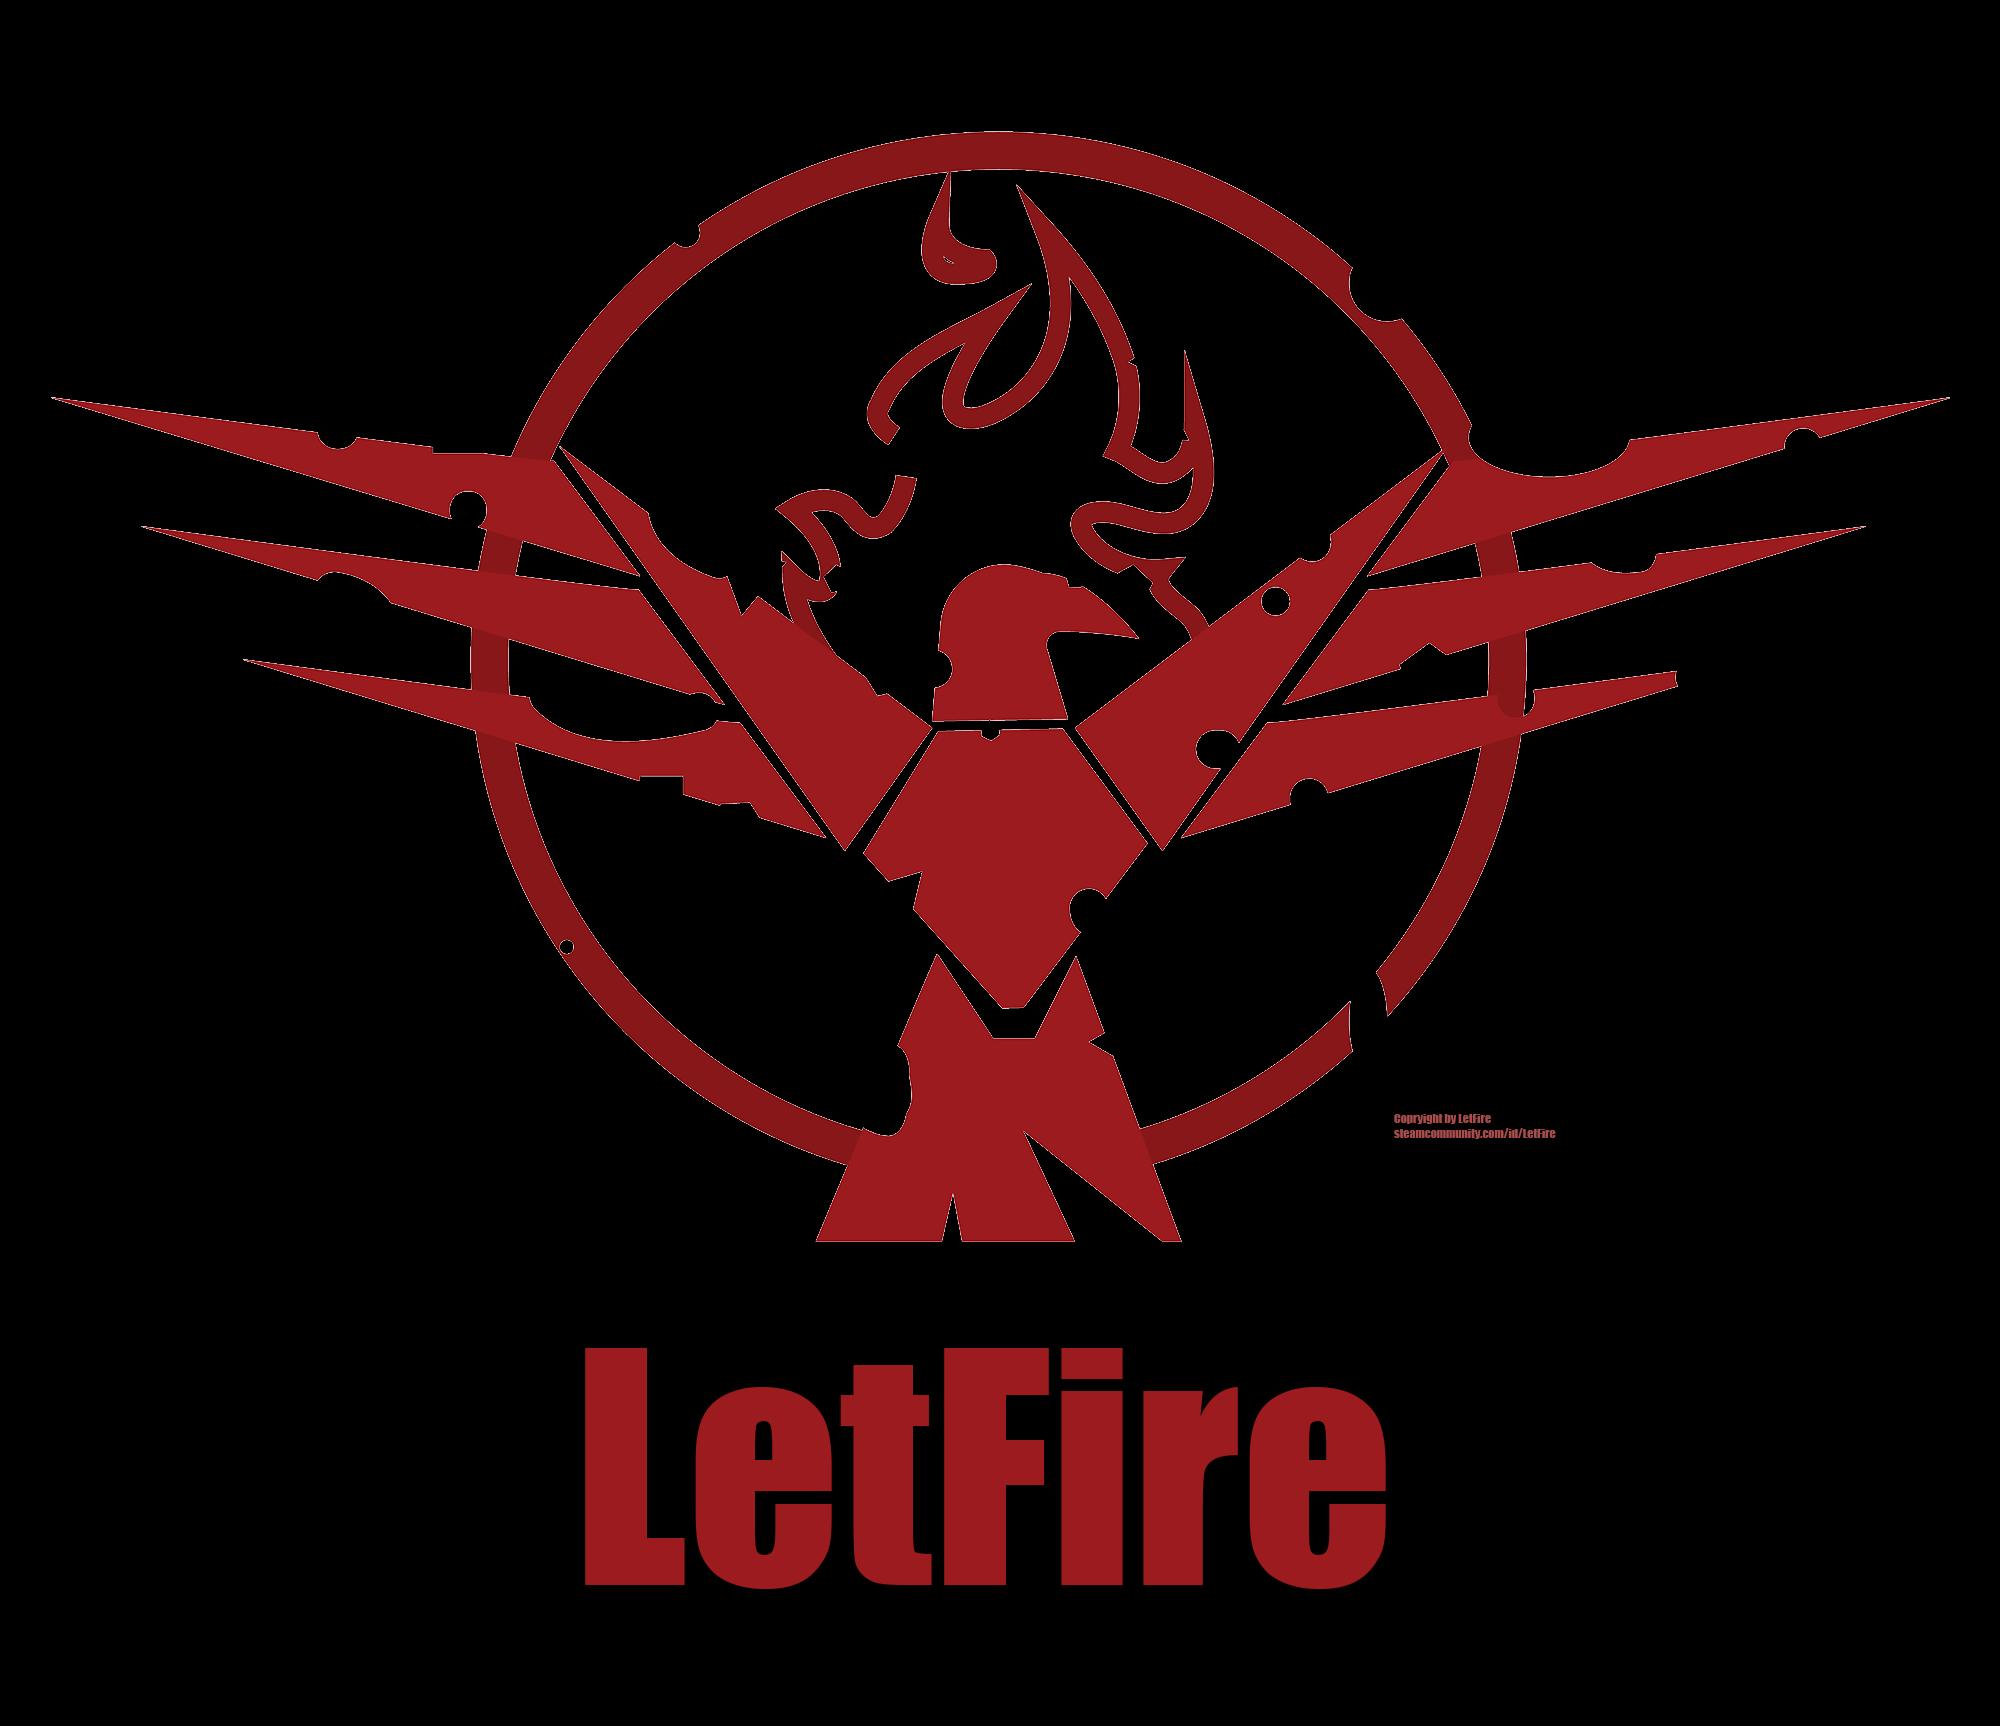 LetFire